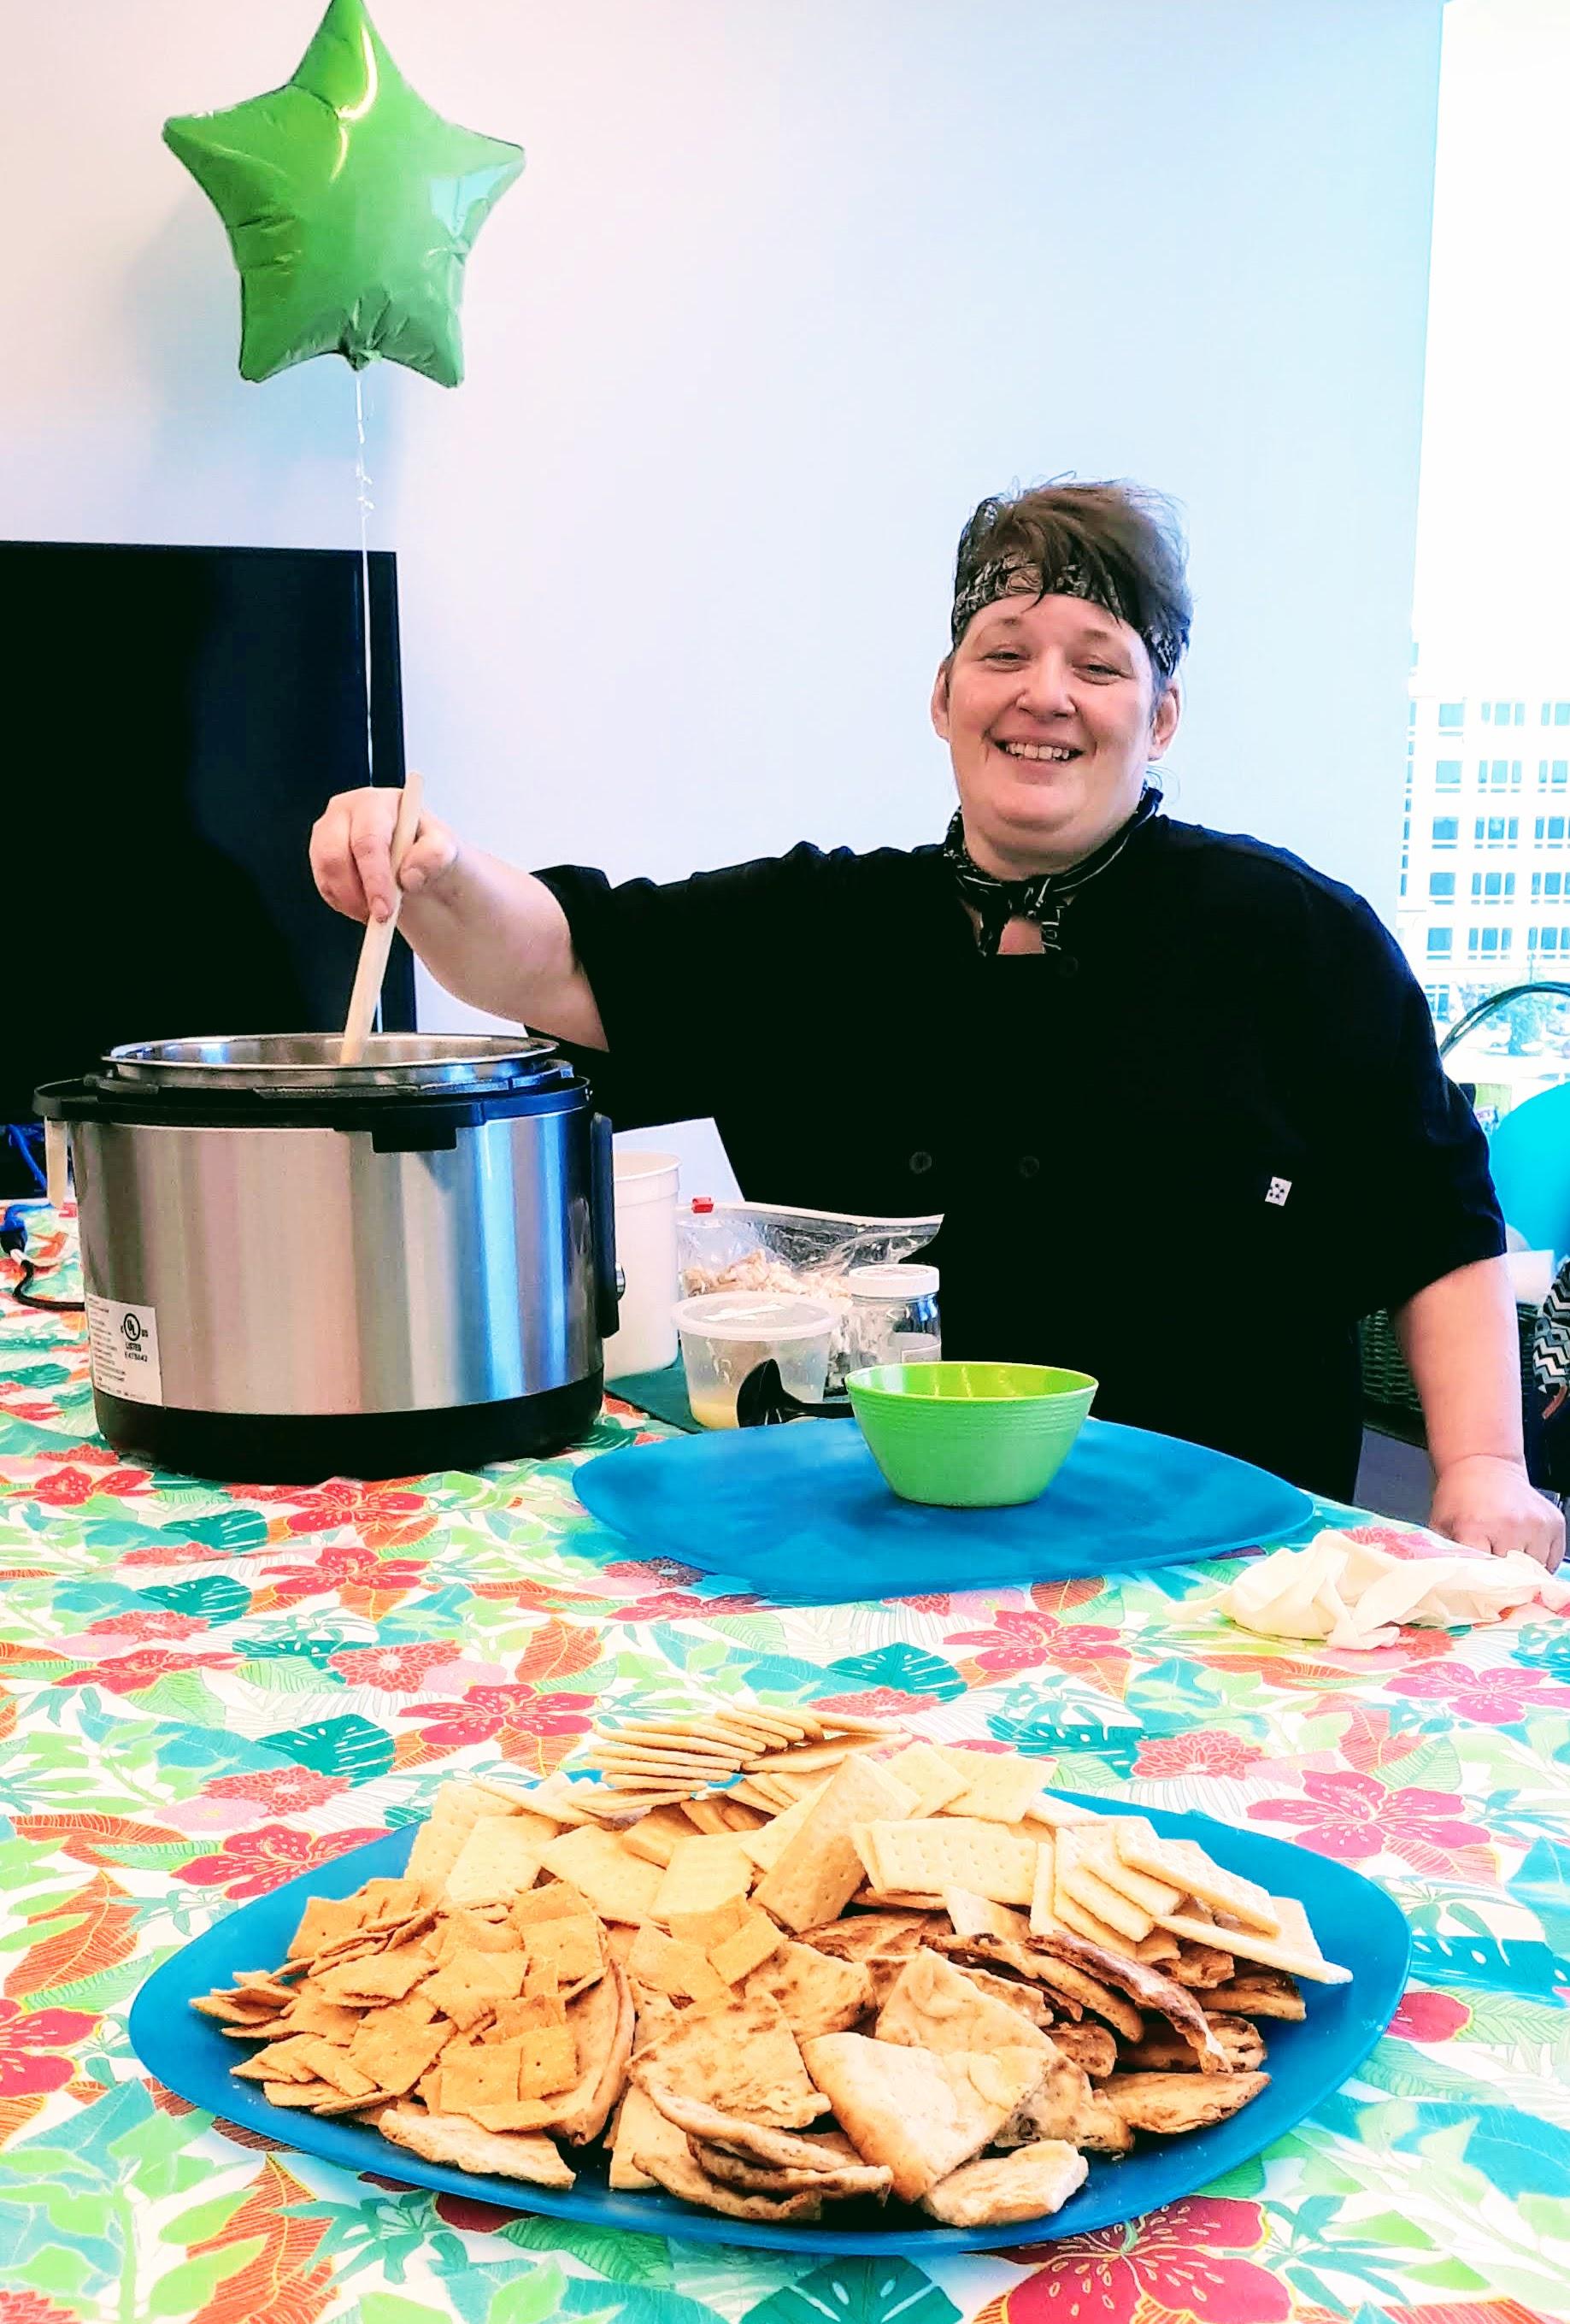 Zacki's terrific assistant Gigi preparing Avgolemono soup with lemon, egg yolks, brown rice and chicken.